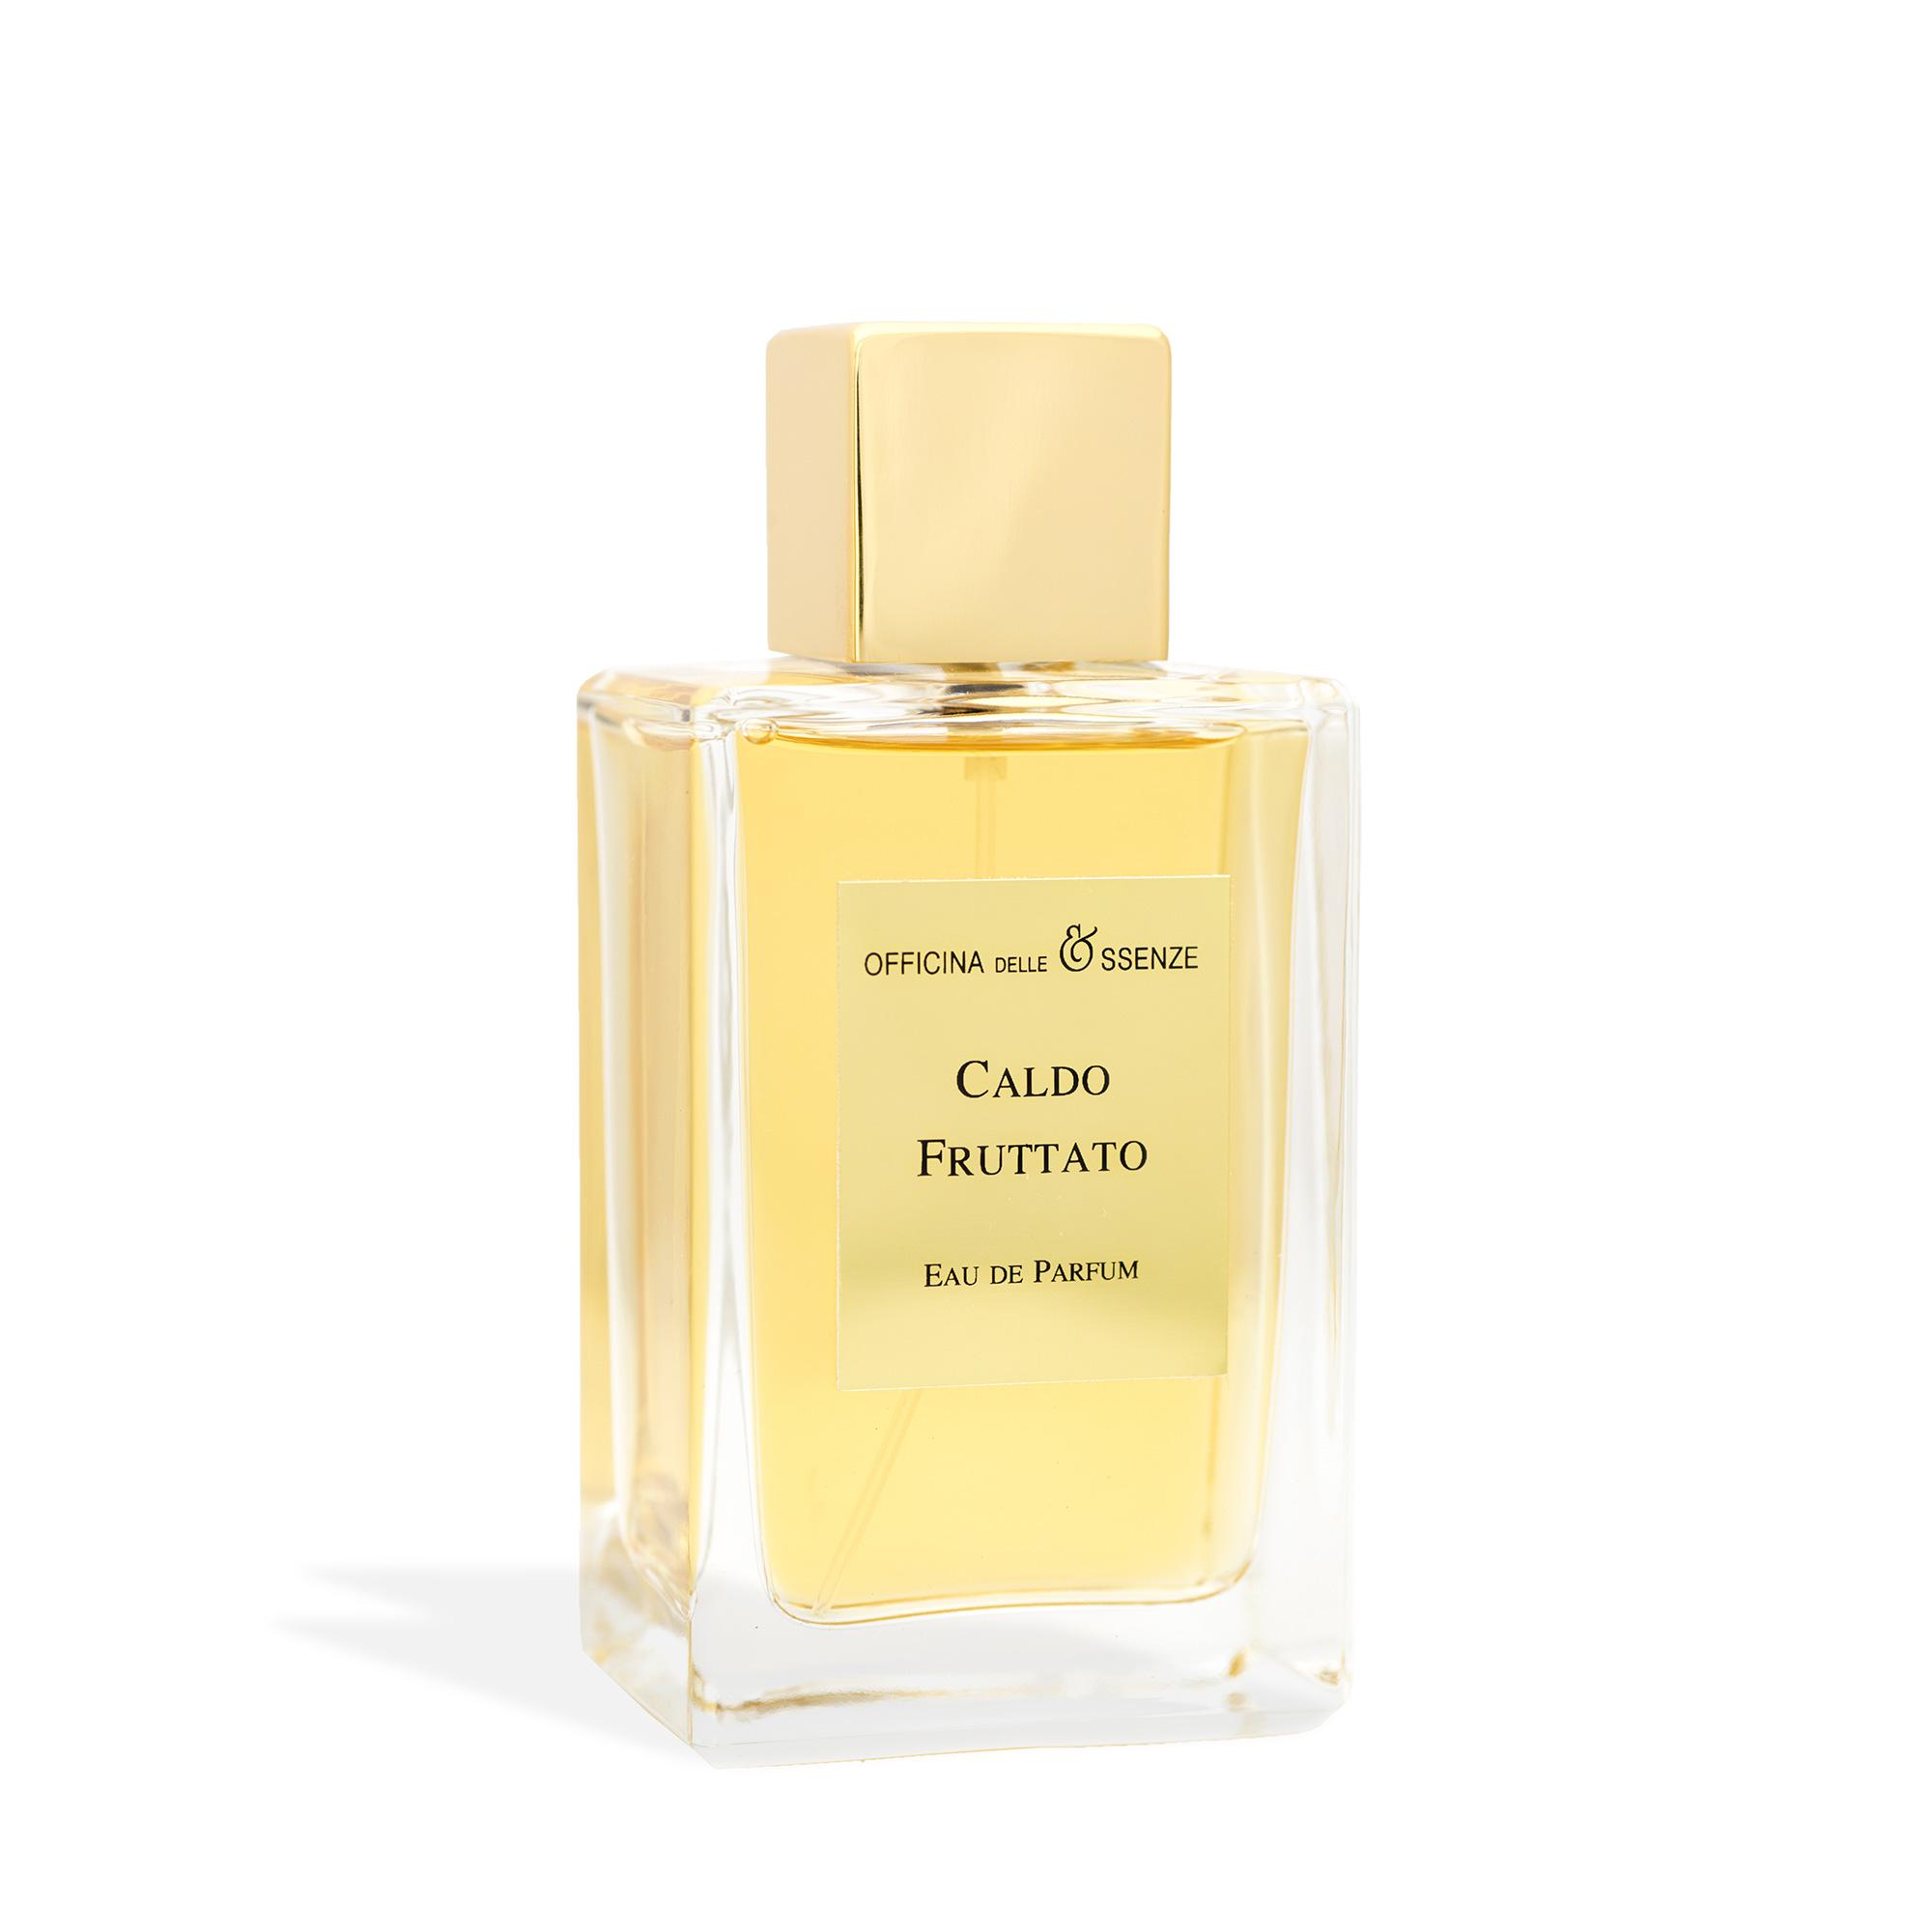 Officina delle Essenze - Caldo Fruttato - Eau de Parfum 100 ml